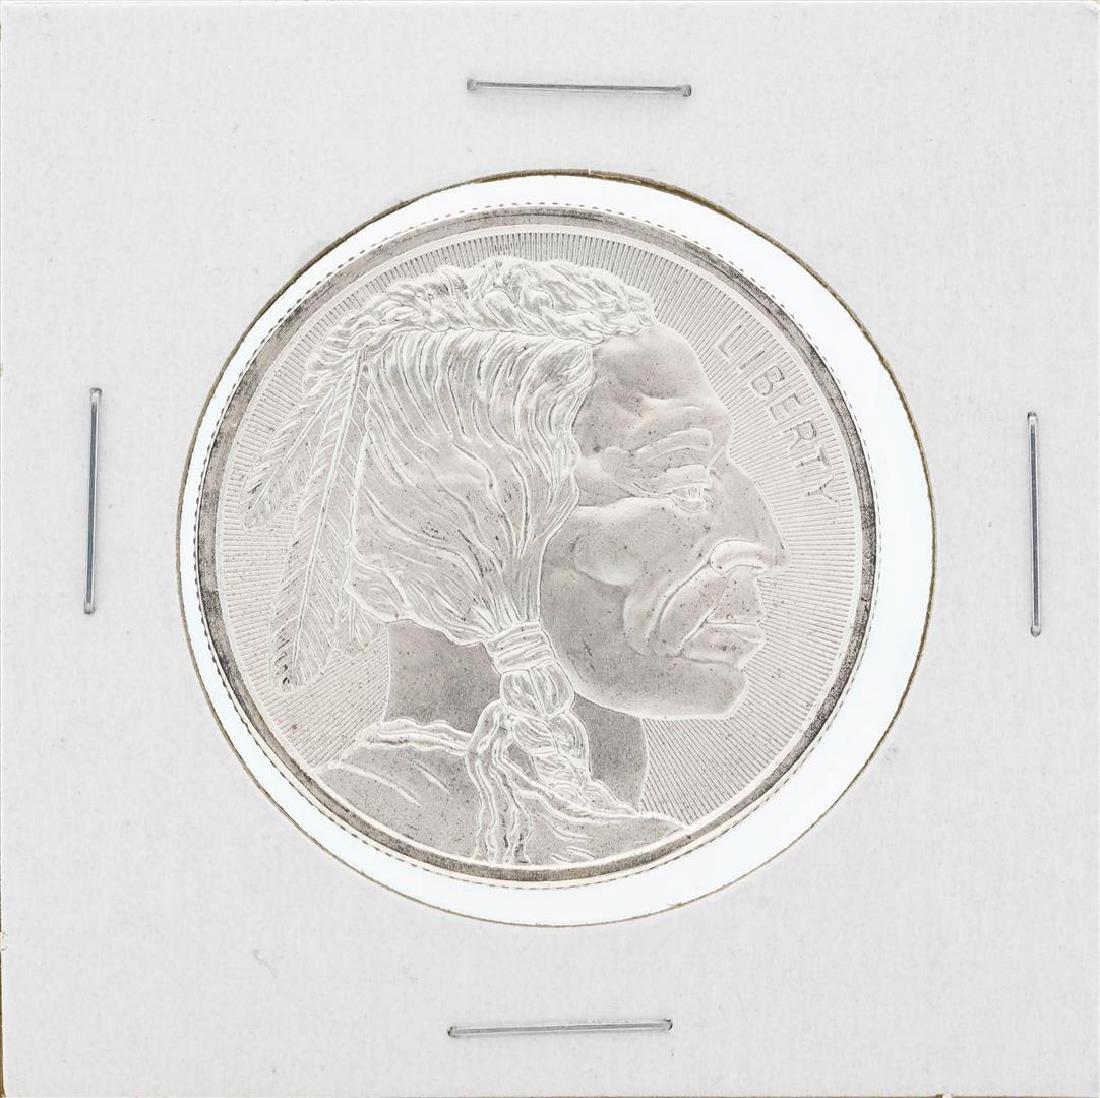 1 oz .999 Fine Silver Buffalo Round - 2